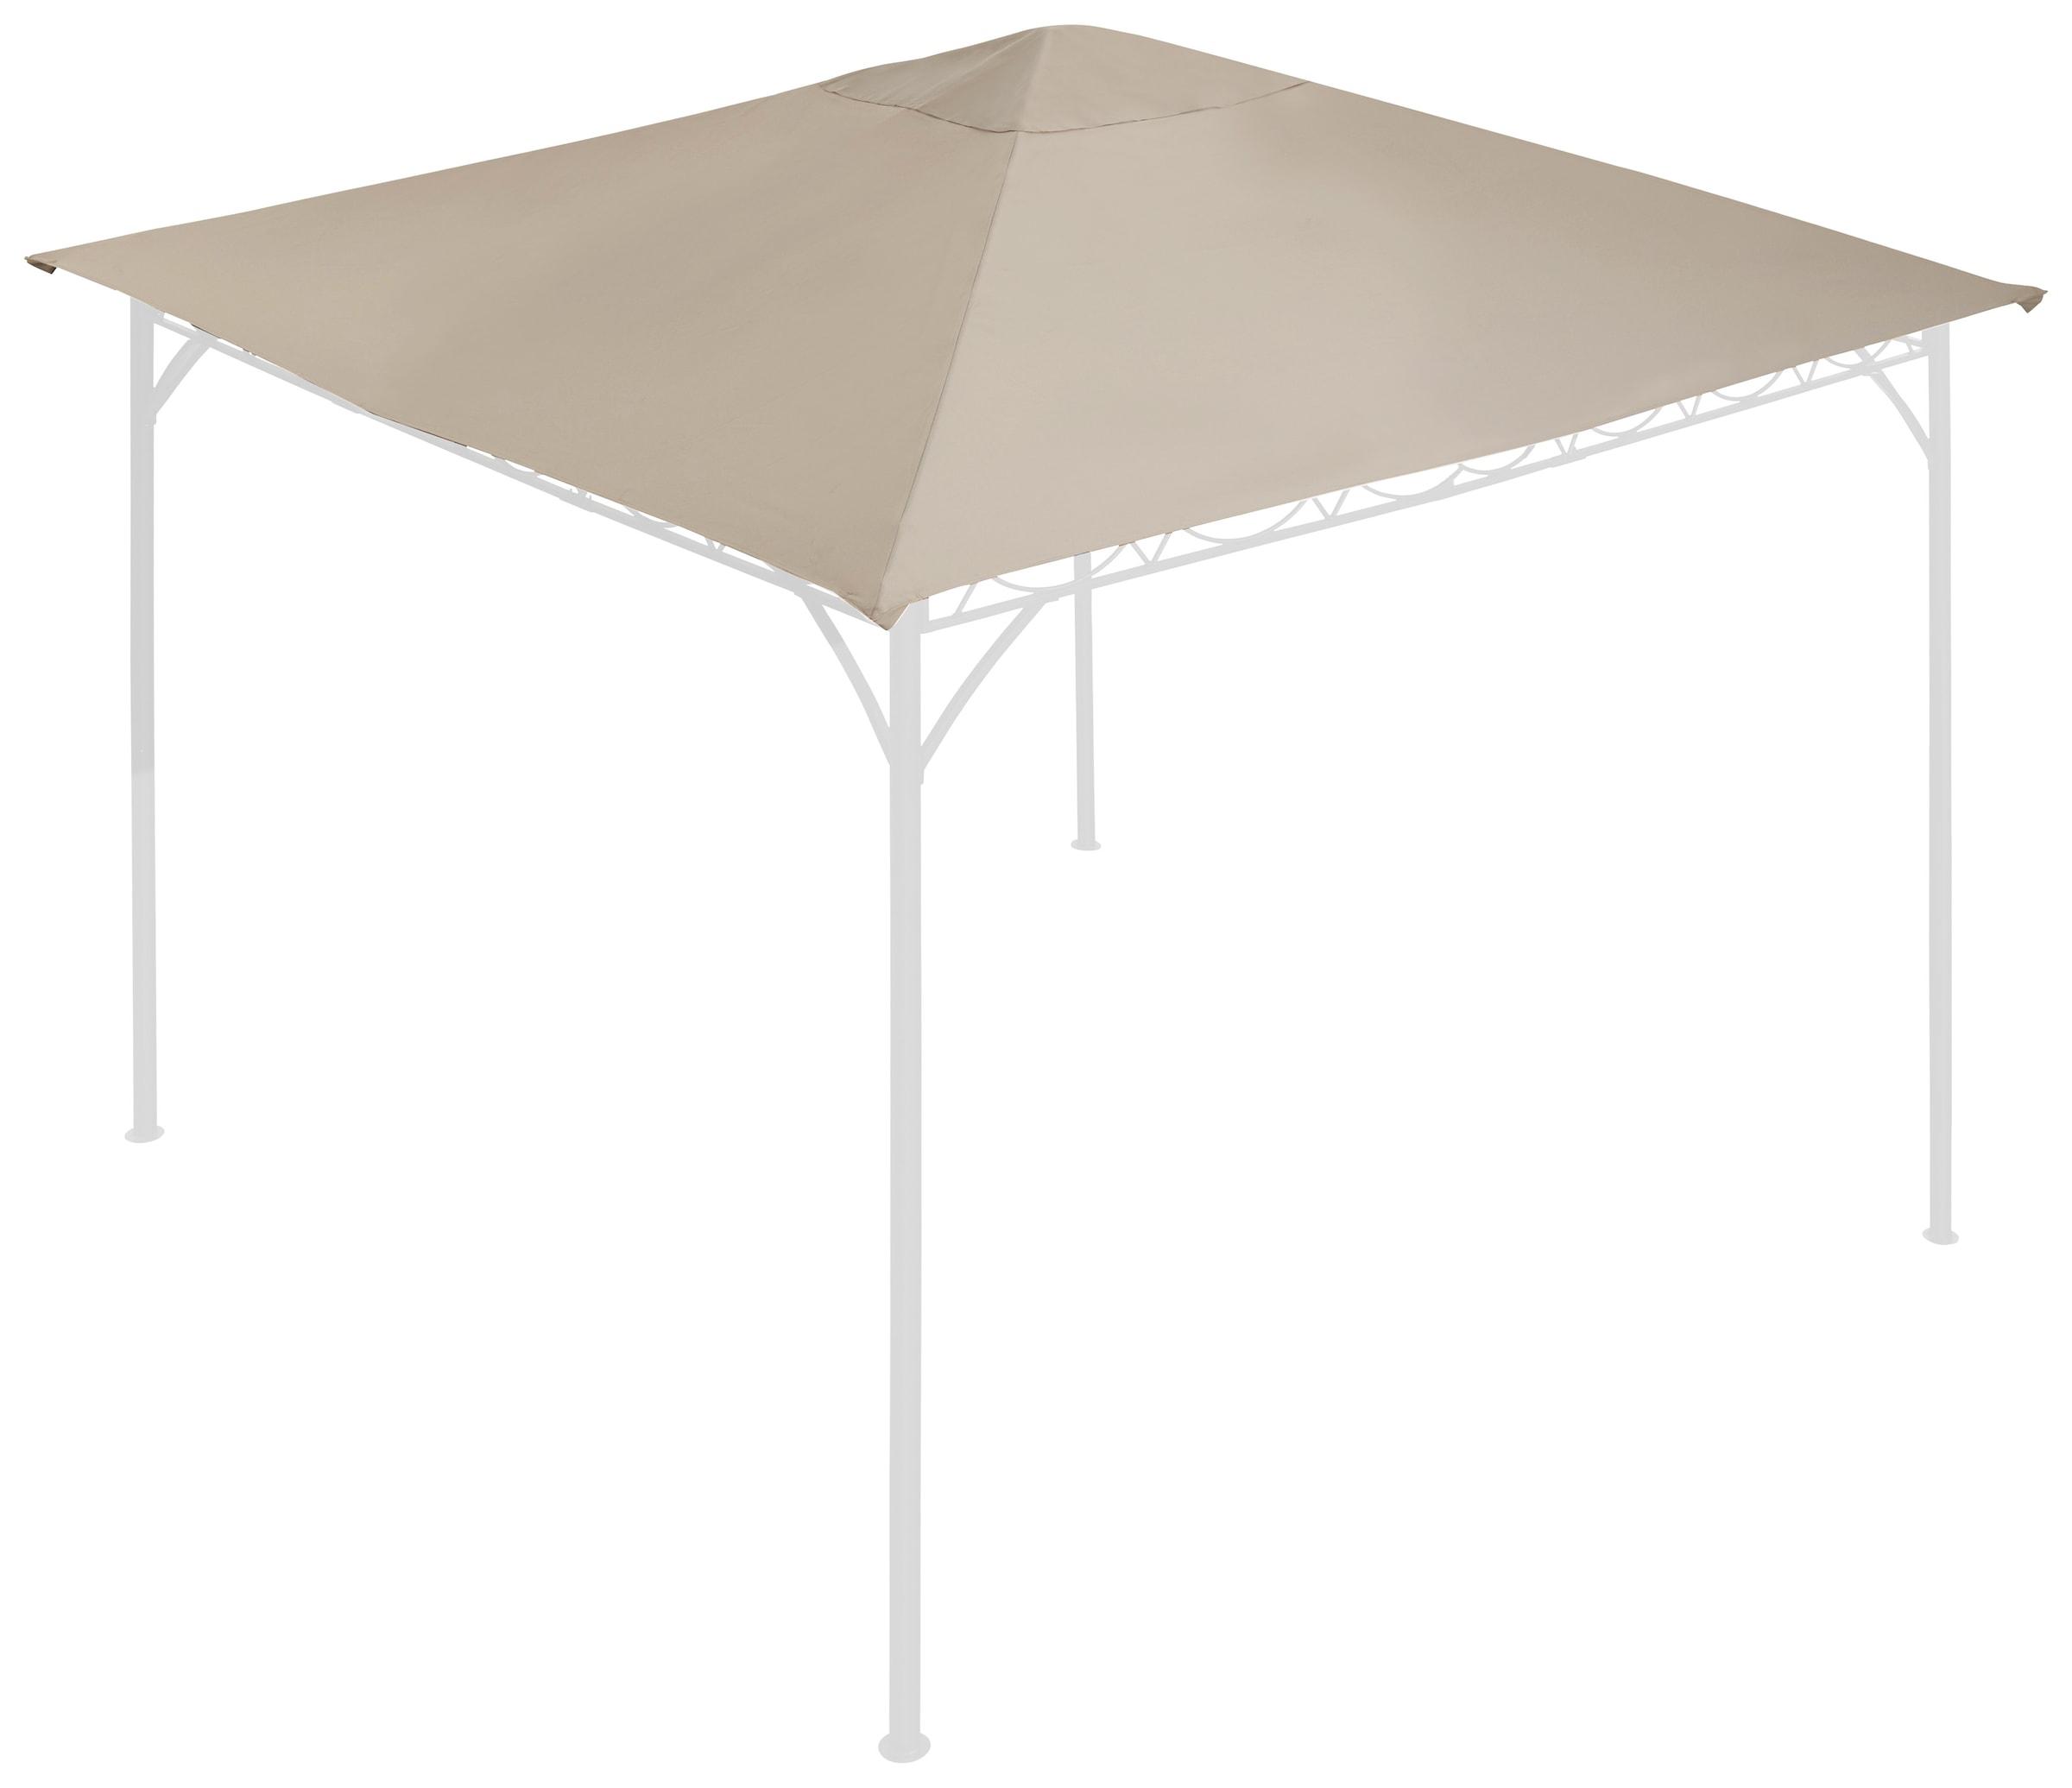 ersatzdach pavillon 3x4 florida ersatzdach pavillon beige. Black Bedroom Furniture Sets. Home Design Ideas